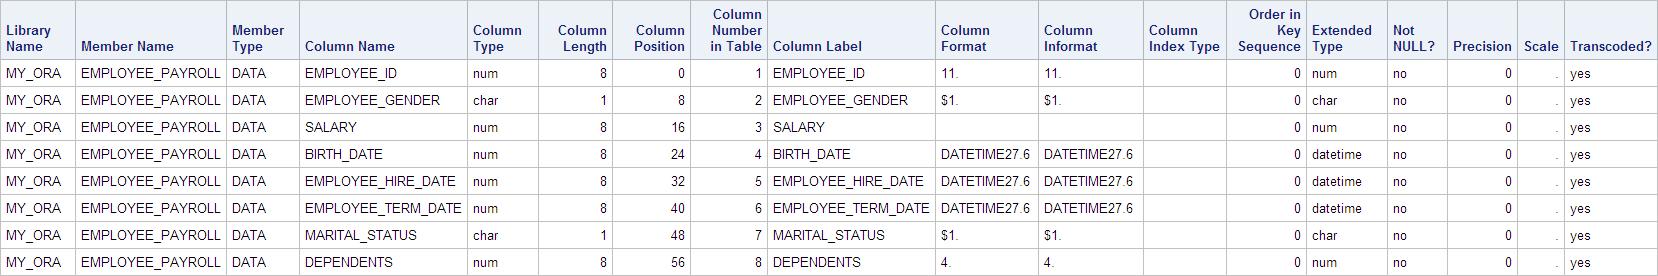 PROC SQL Dictionary.Columns query output